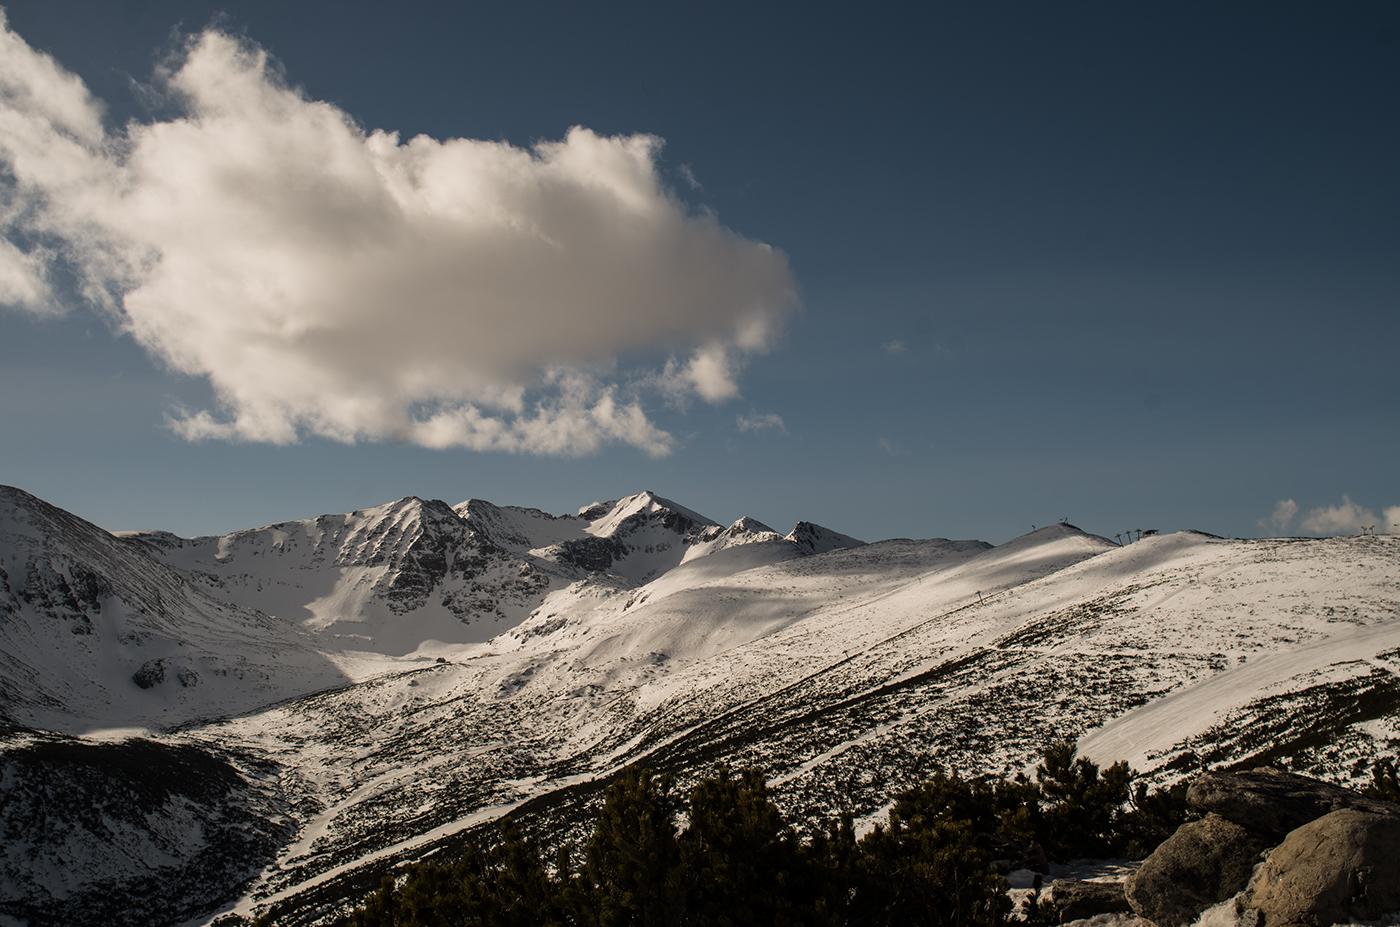 Mount Musala from the Yastrebets Ski Station.